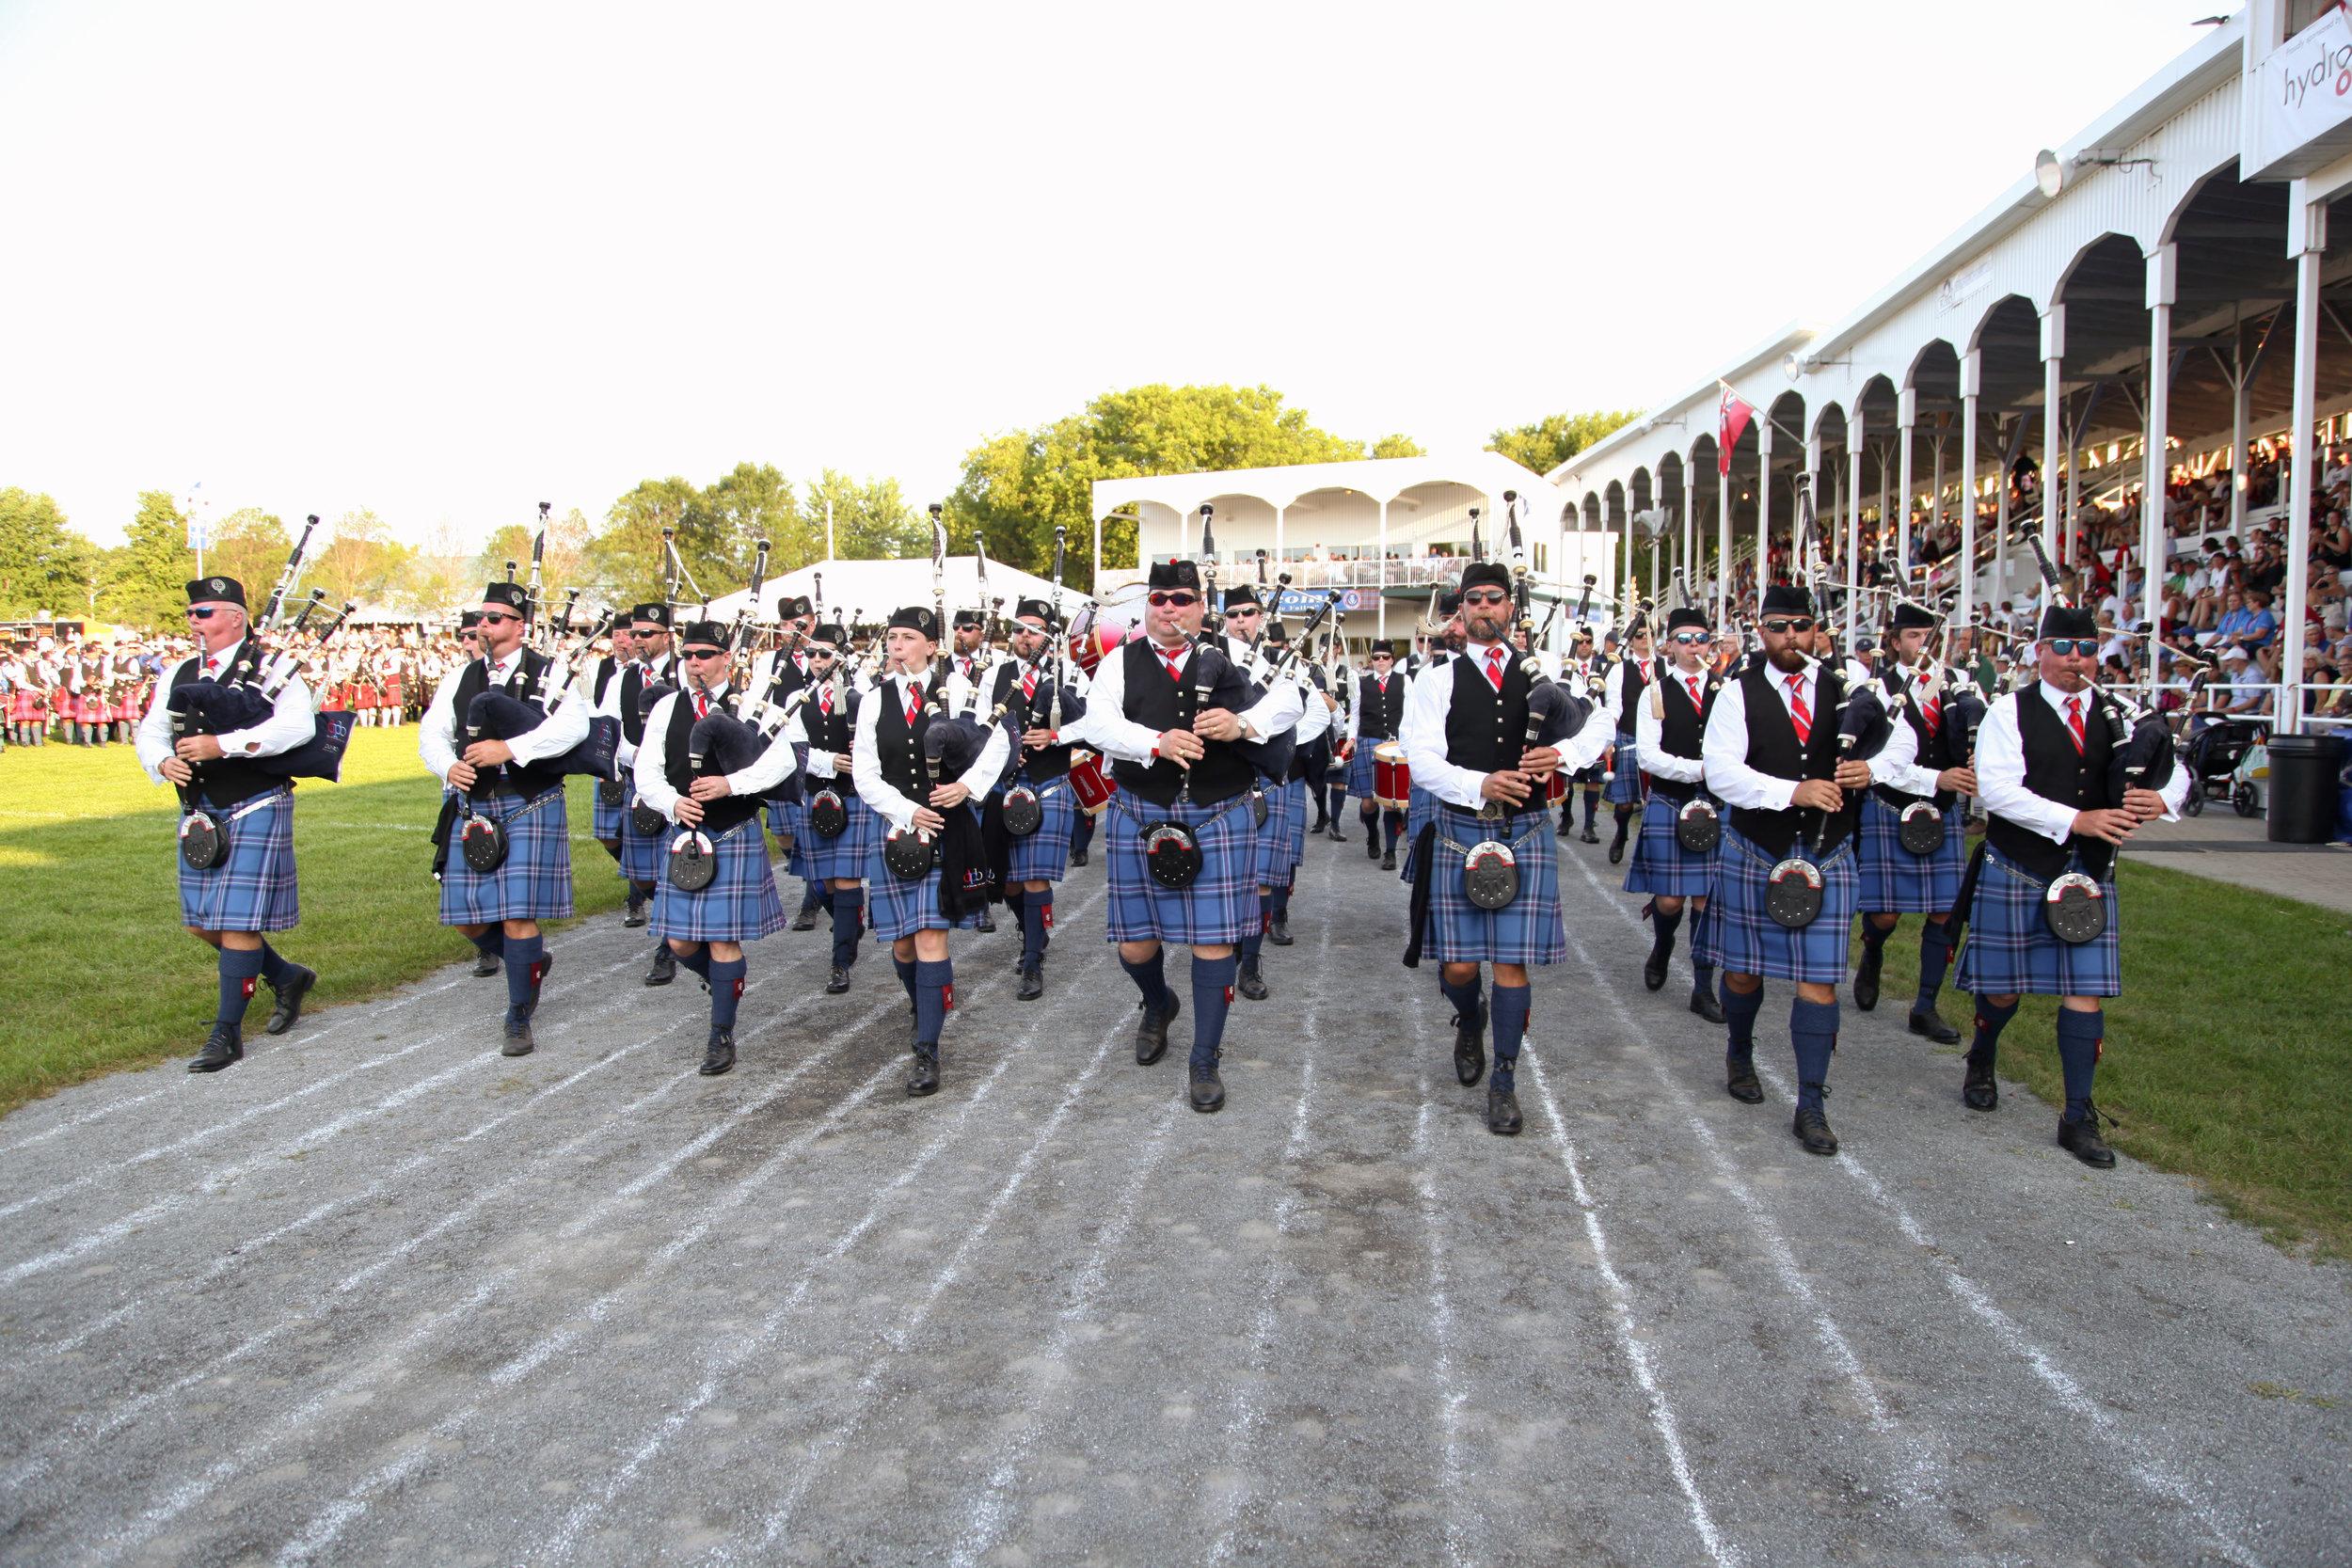 City of Dunedin Pipe Band